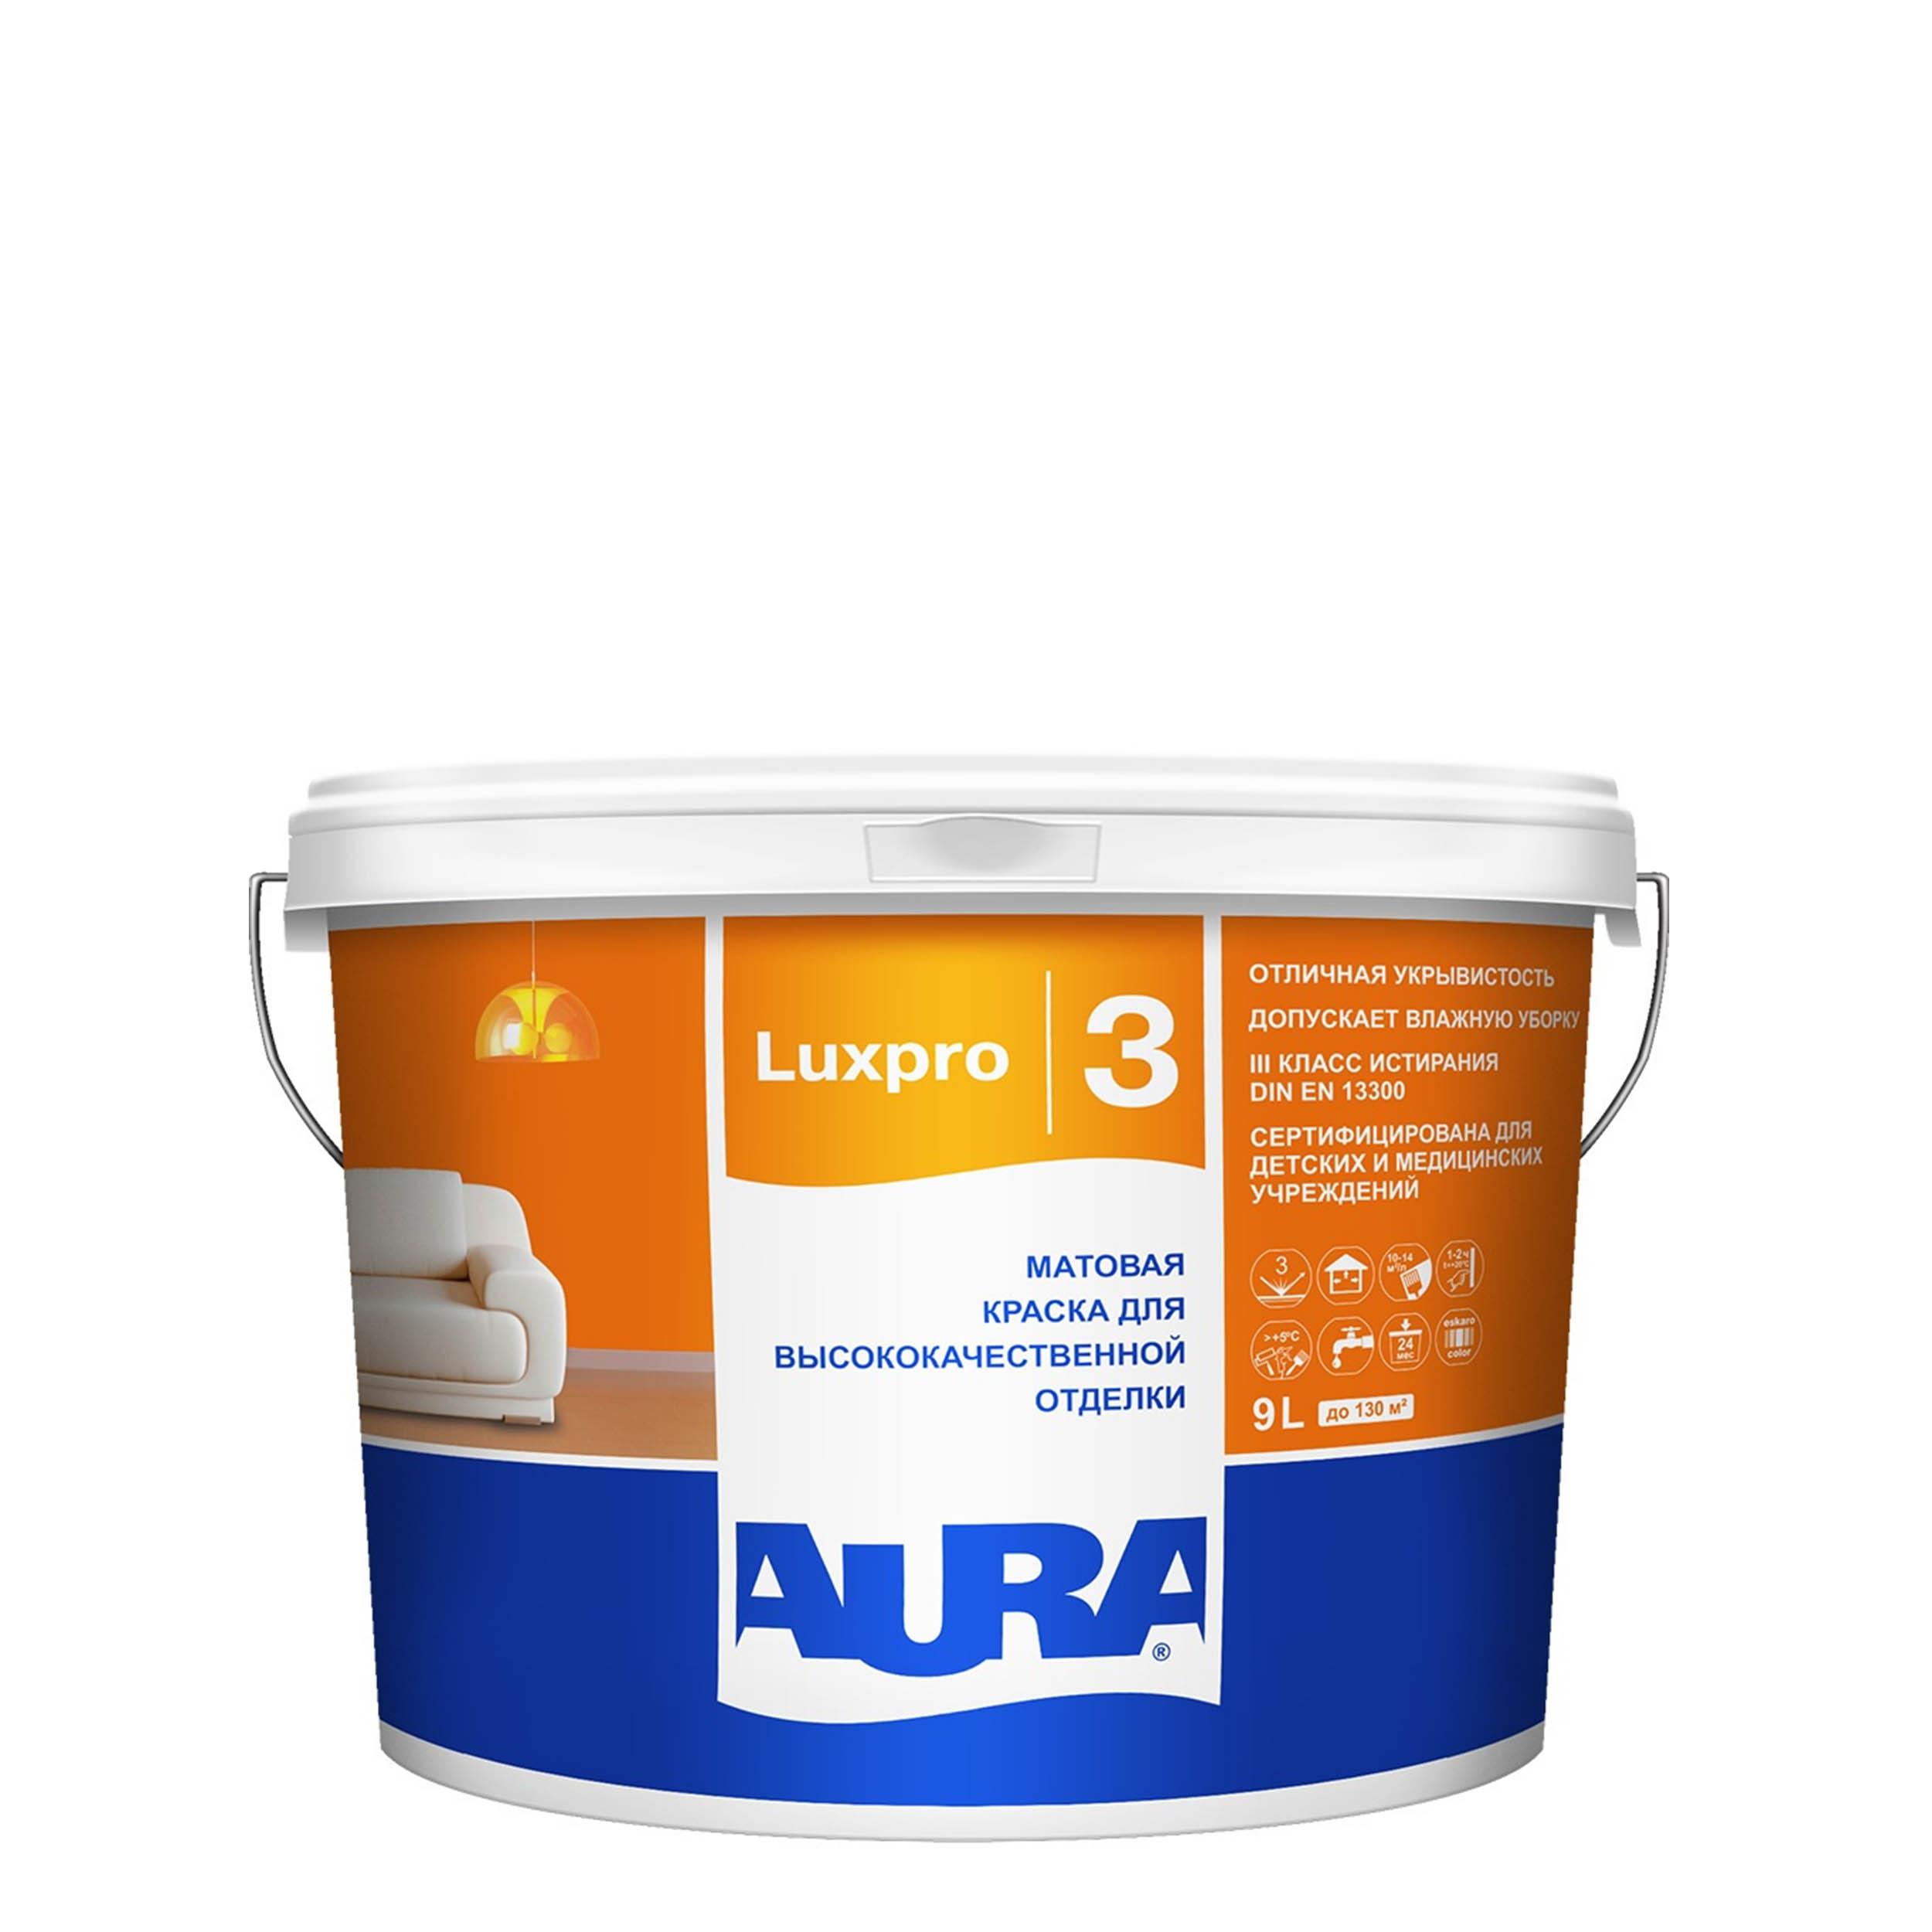 Фото 3 - Краска интерьерная, Aura LuxPRO 3, RAL 6025, 11 кг.